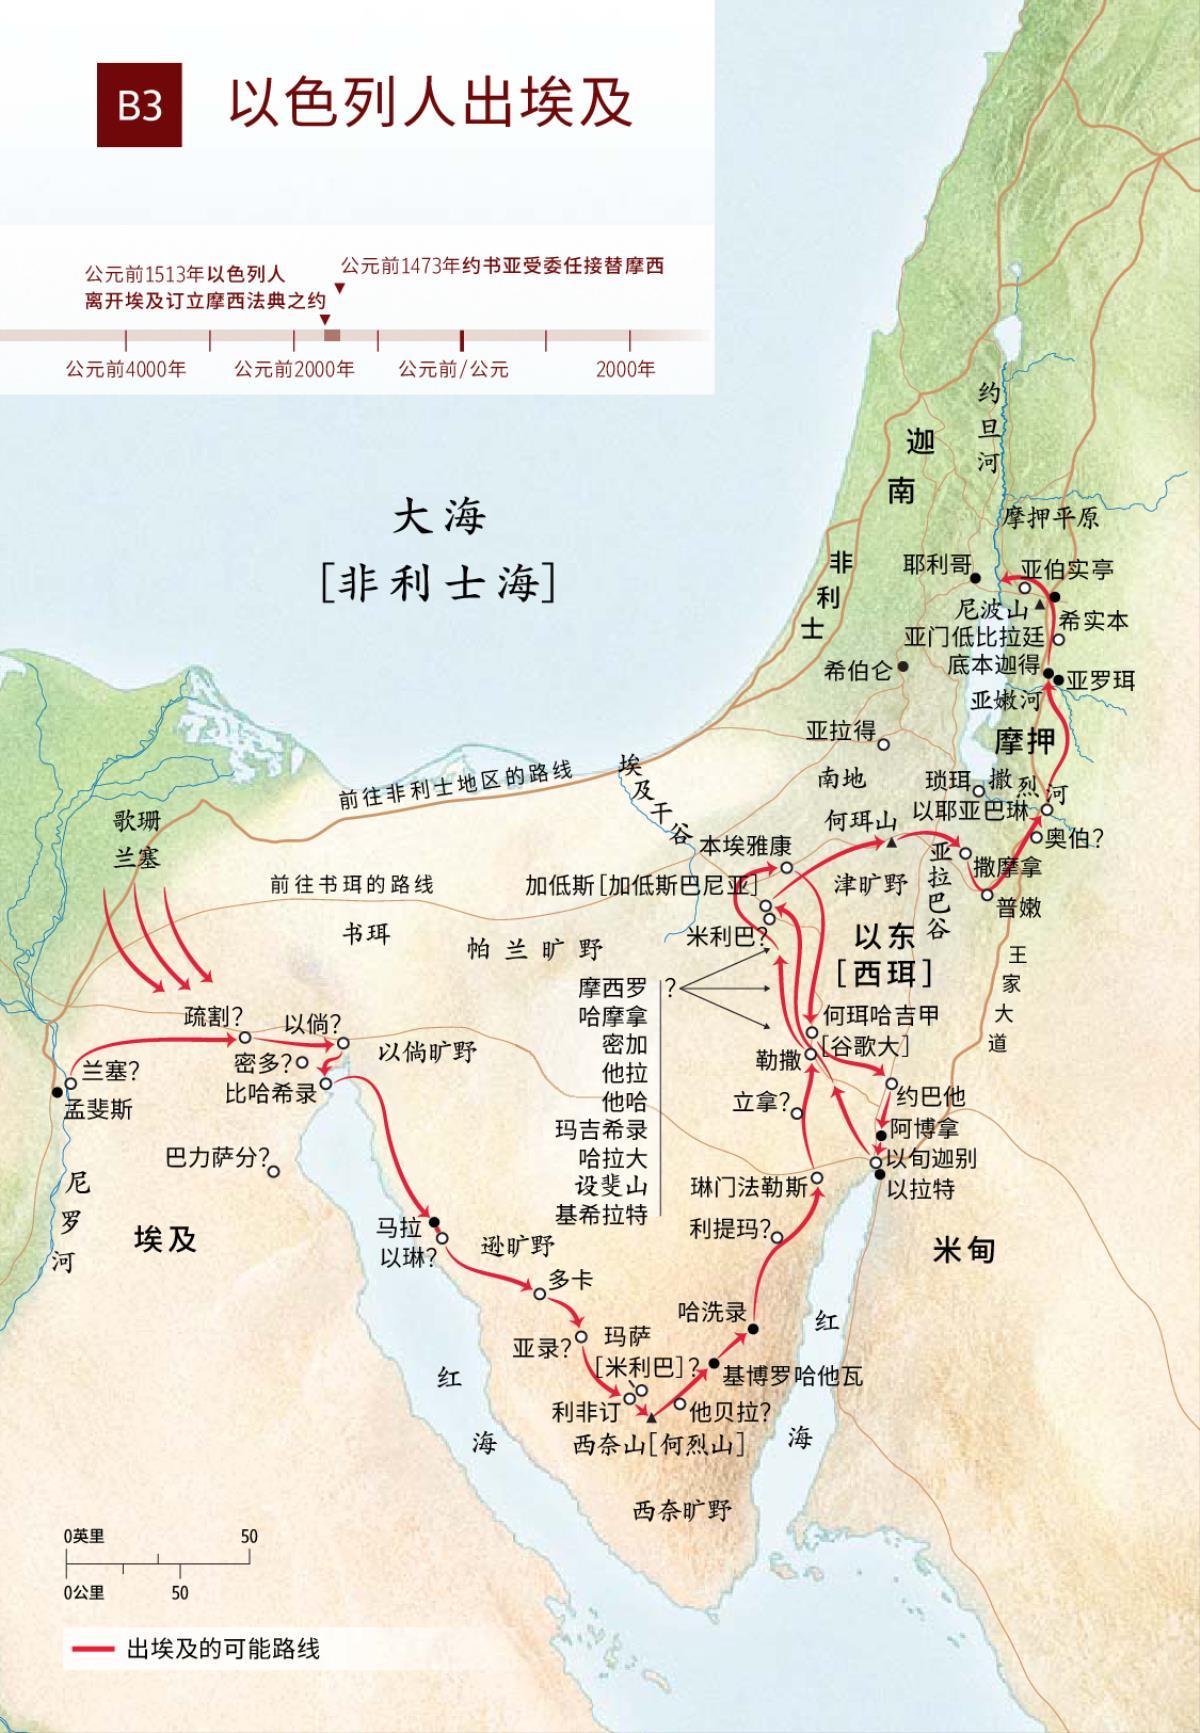 B3 以色列人出埃及 — 守望臺線上書庫